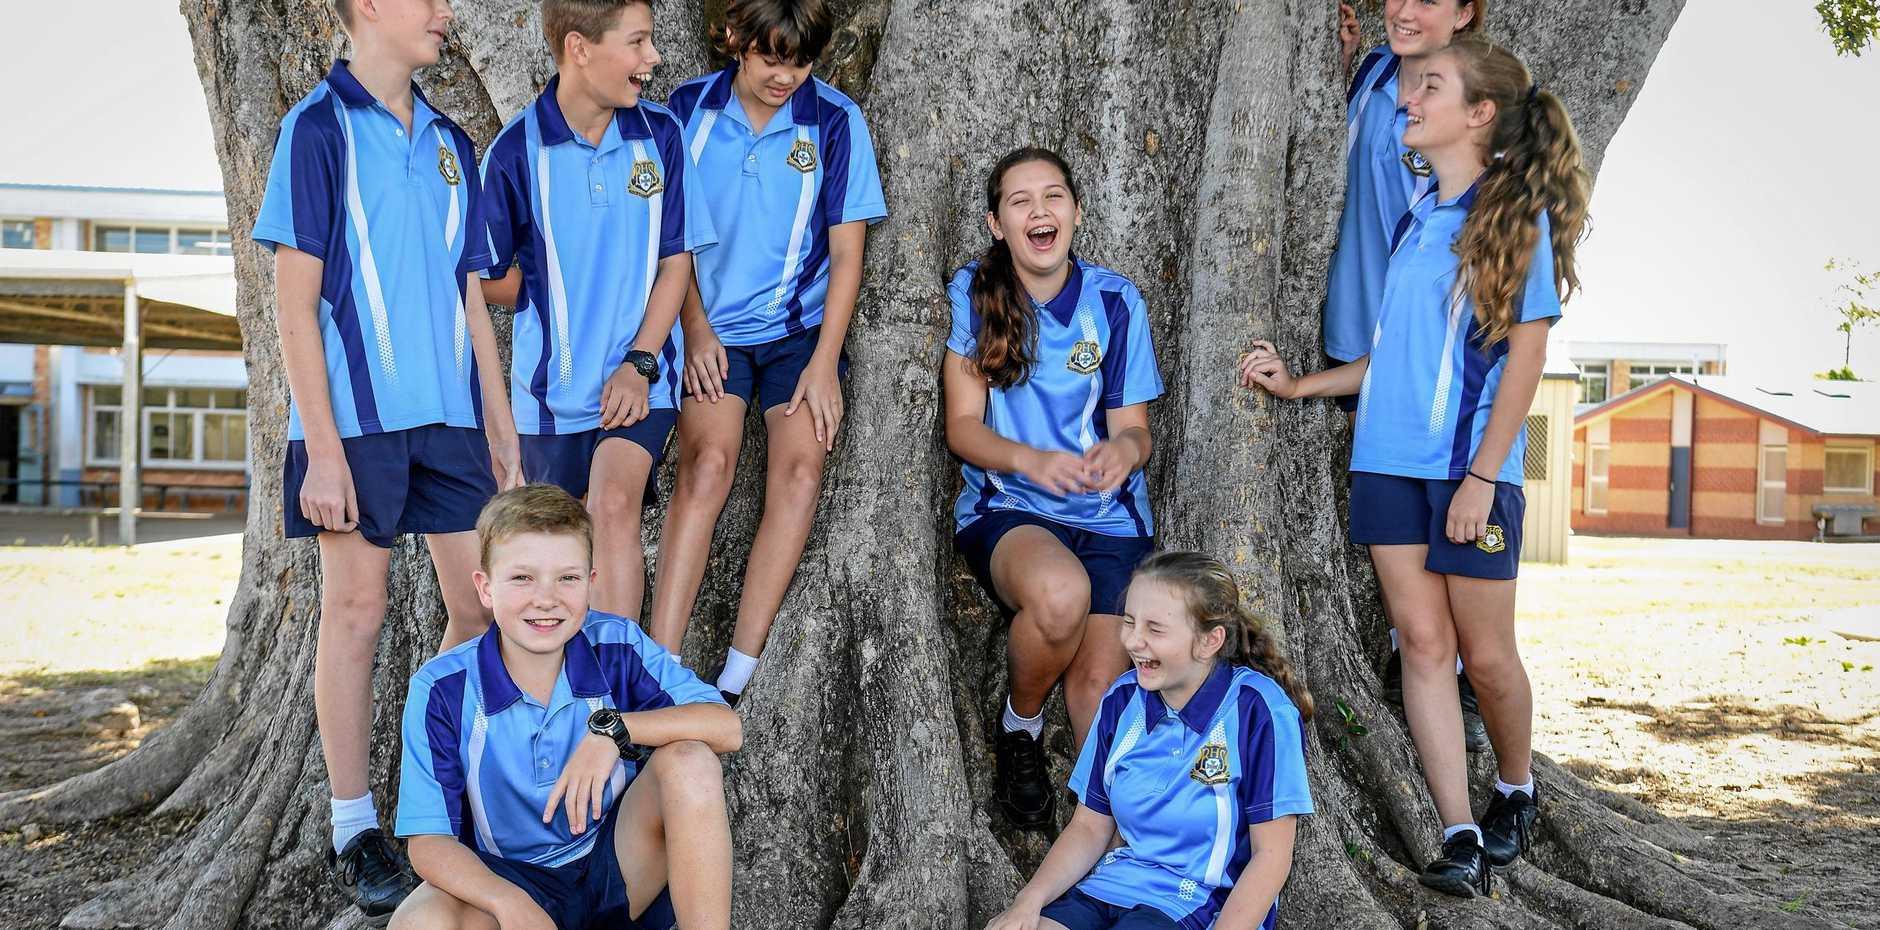 Bundaberg High School students Chris Collins, Sam Stuchbery, Josh Anderson, Scarlett Wallace, Lucy Steindl, Cadence Taylor, Fletcher Churchill and Sarah Warren.